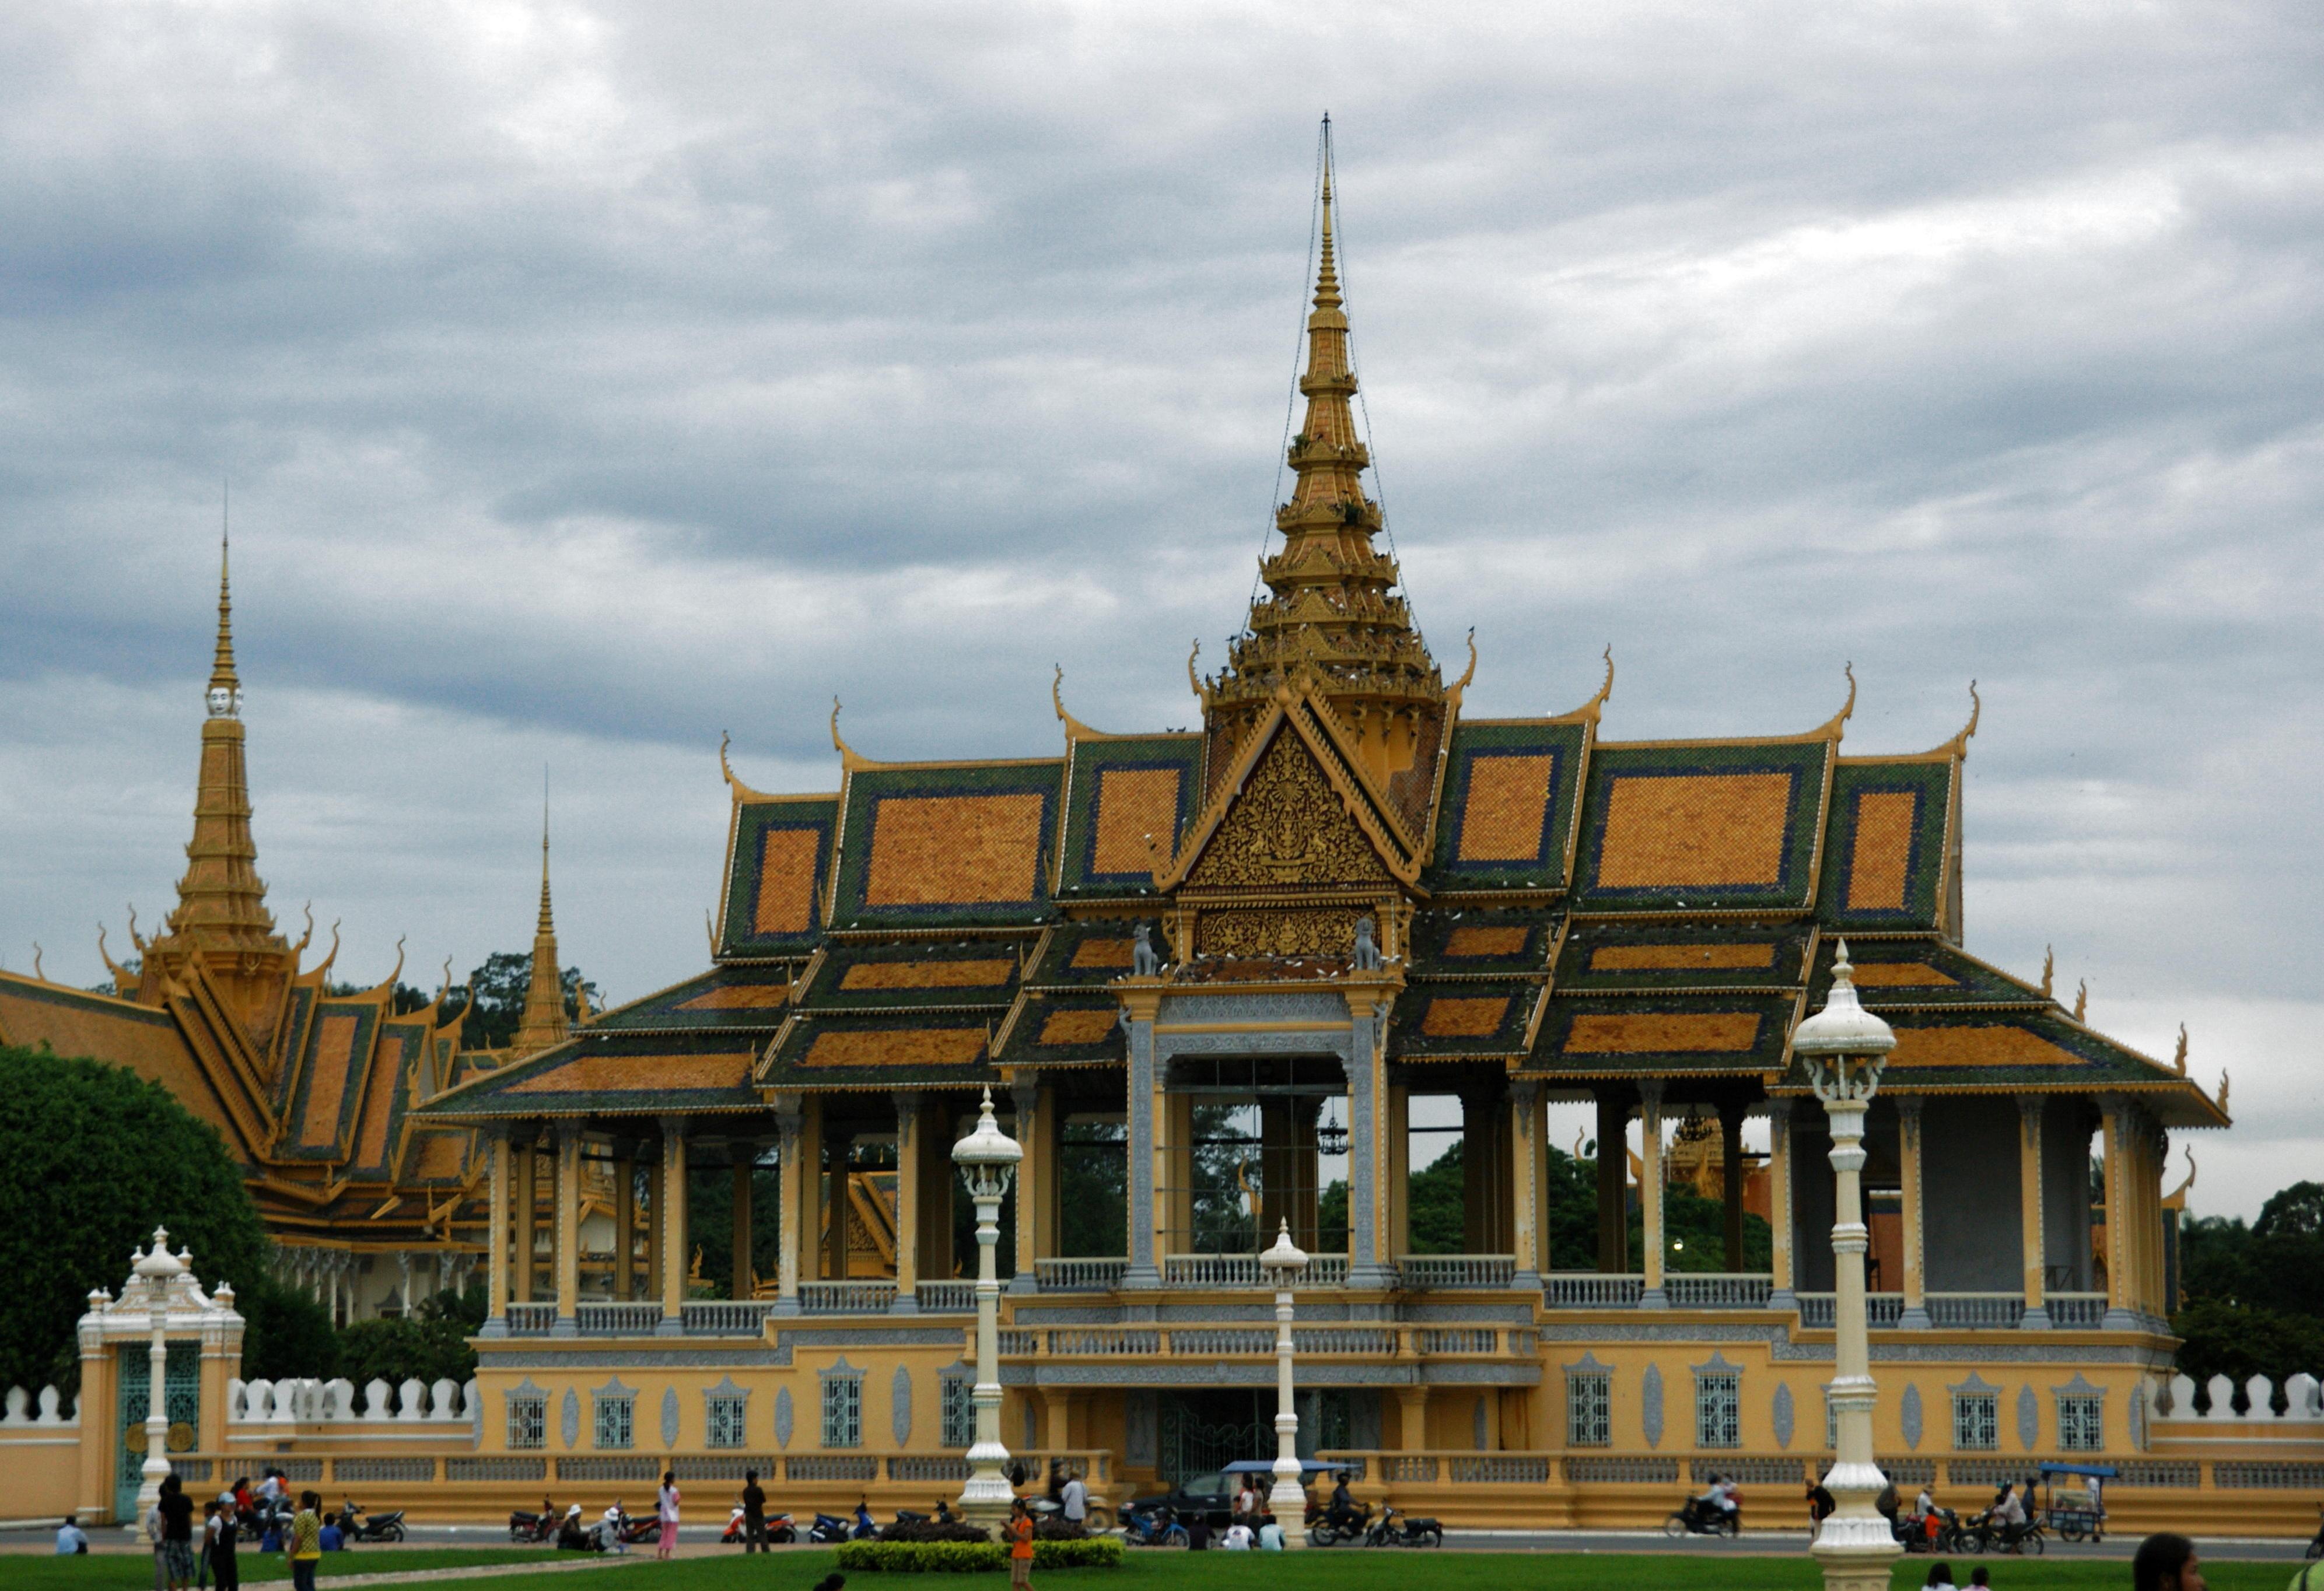 Royal Pavilion Logo File:chan Chaya Royal Pavilion